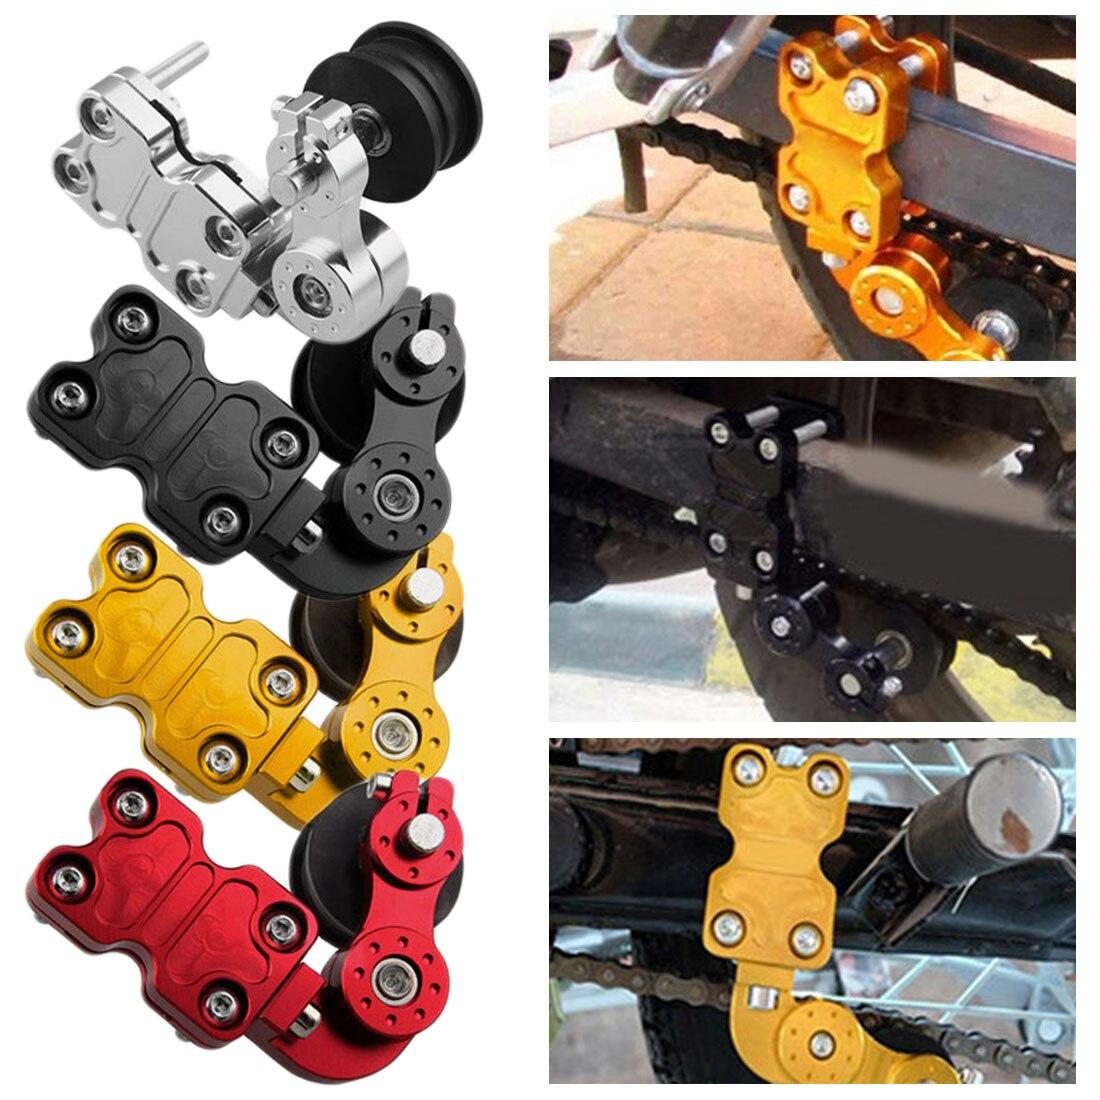 Rodillo tensor de cadena de ajuste de aluminio portátil Universal 4 colores accesorios modificados para motocicleta